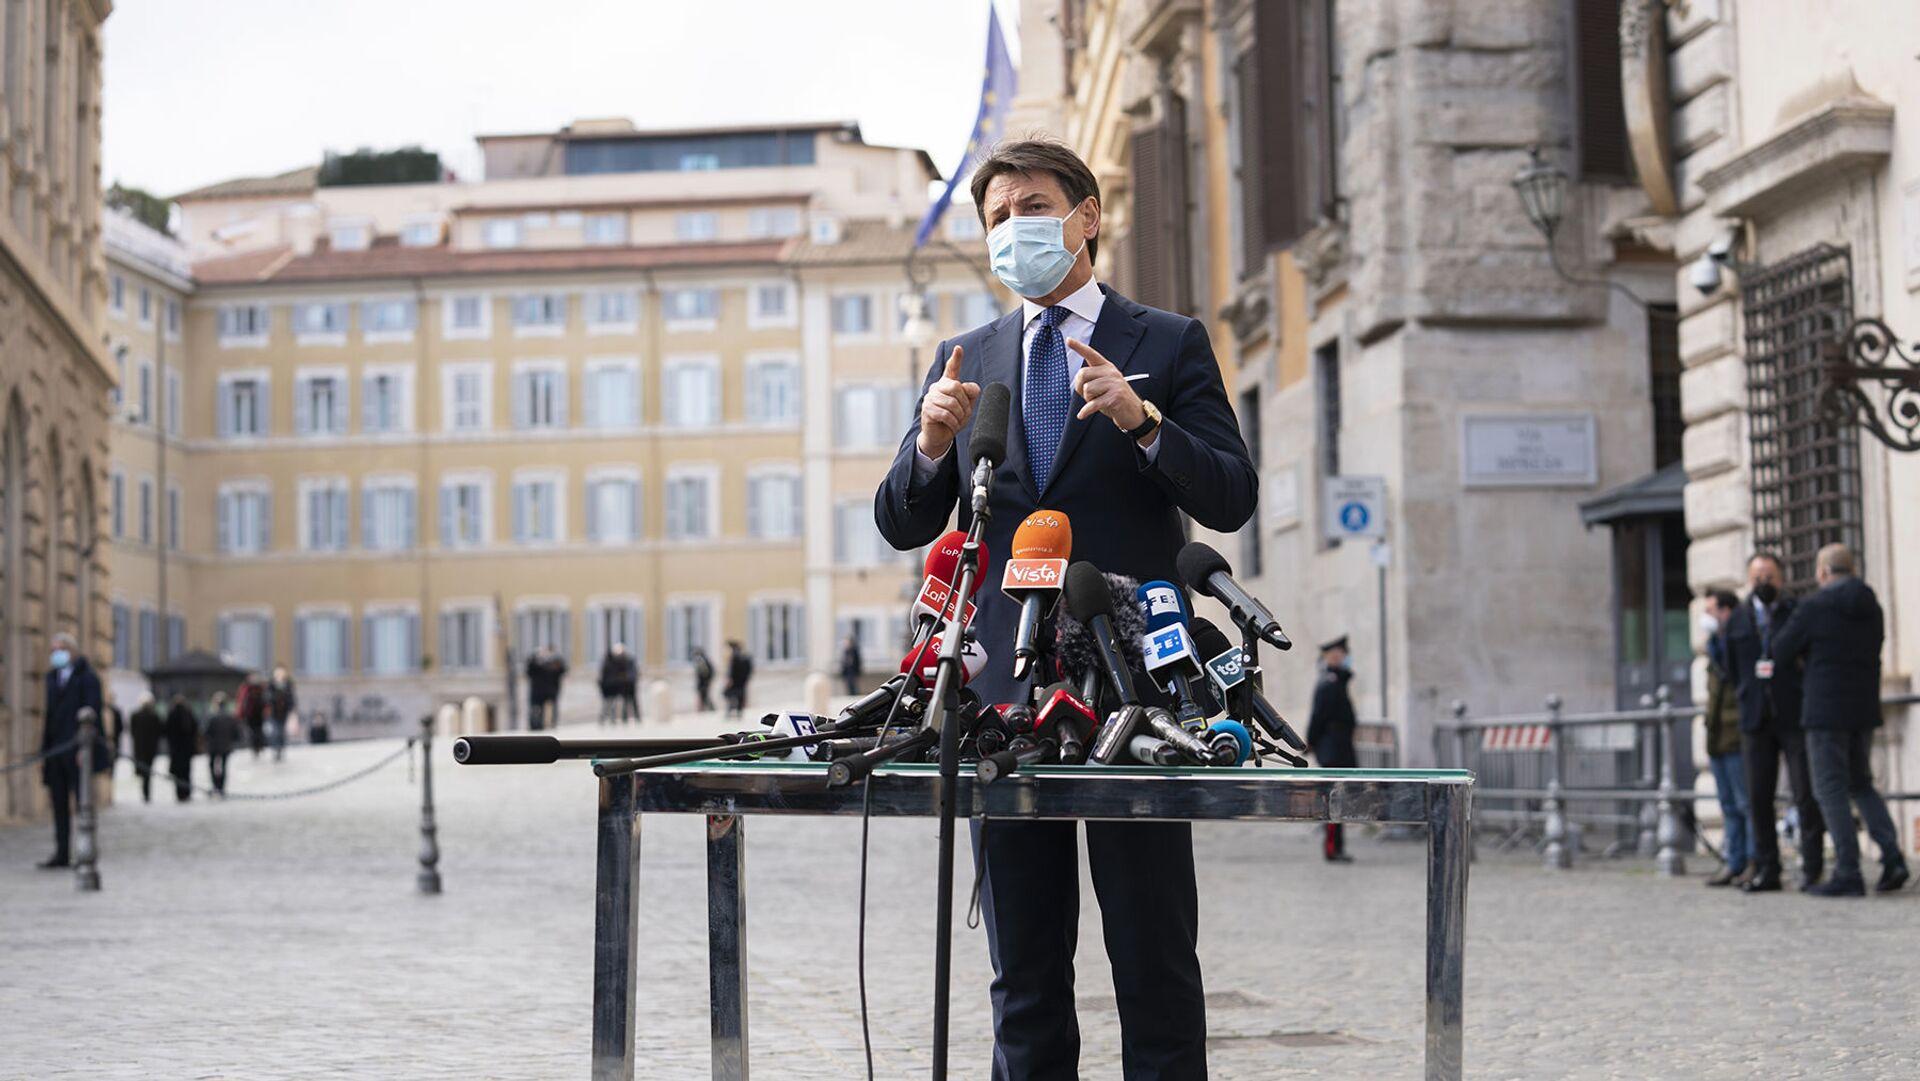 Giuseppe Conte incontra la stampa  - Sputnik Italia, 1920, 06.02.2021